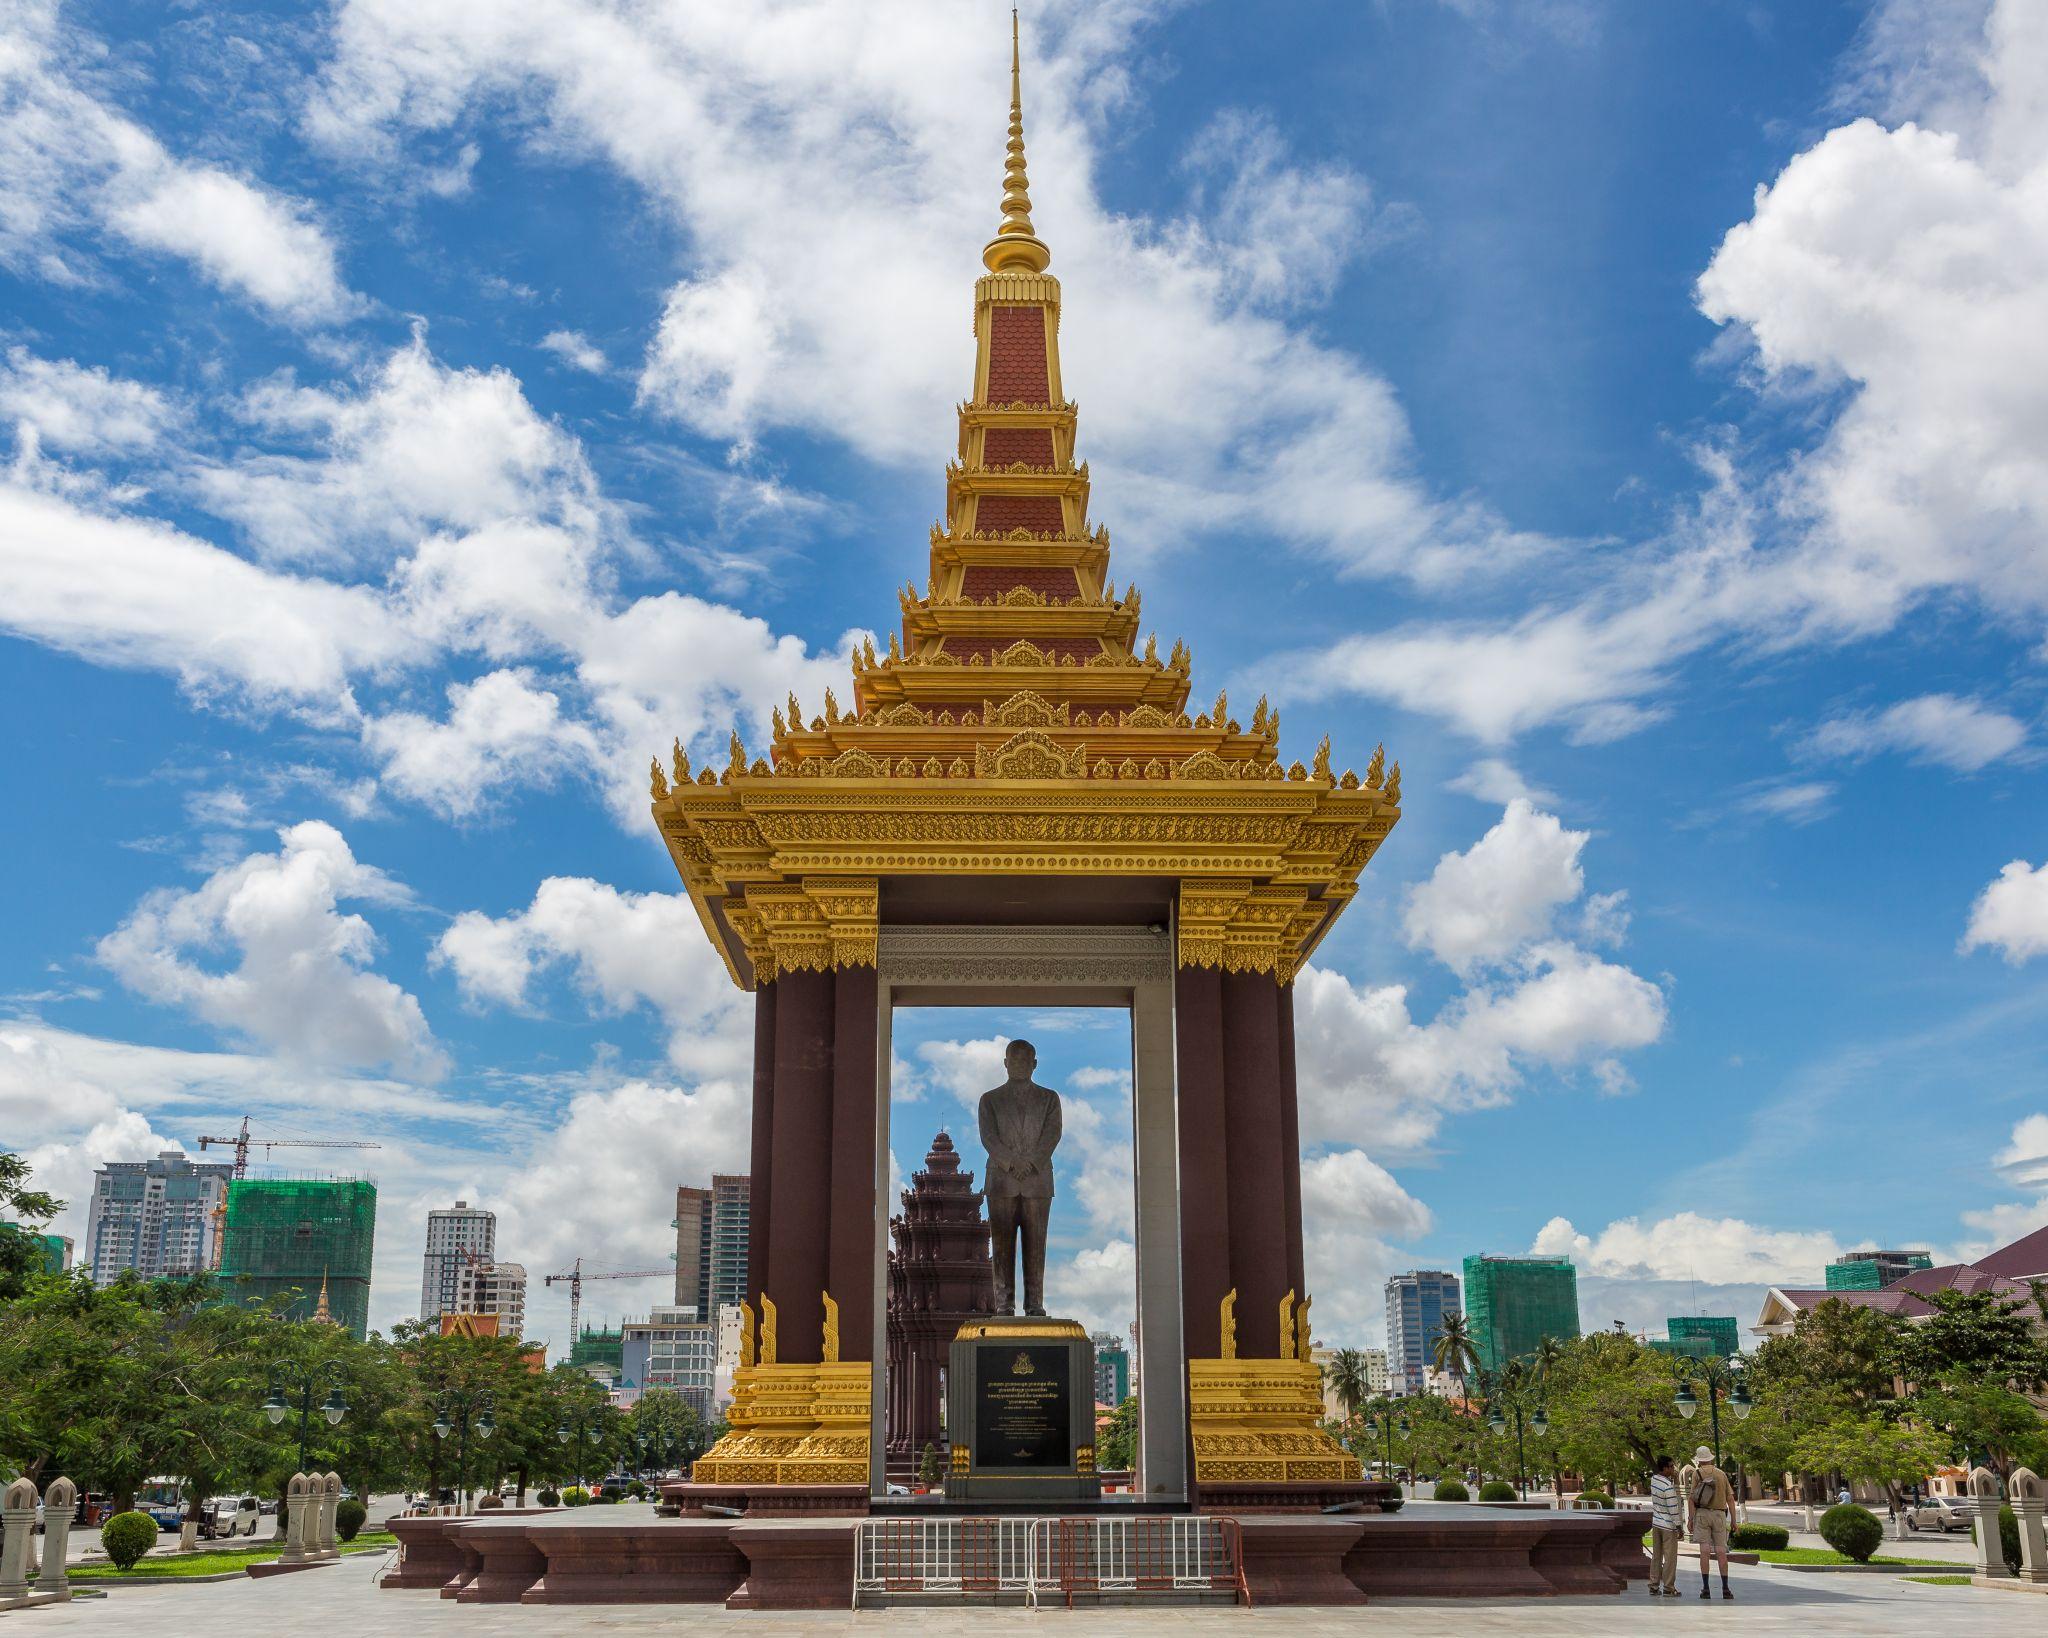 Statue of King Father Norodom Sihanouk, Phnom Penh, Cambodia